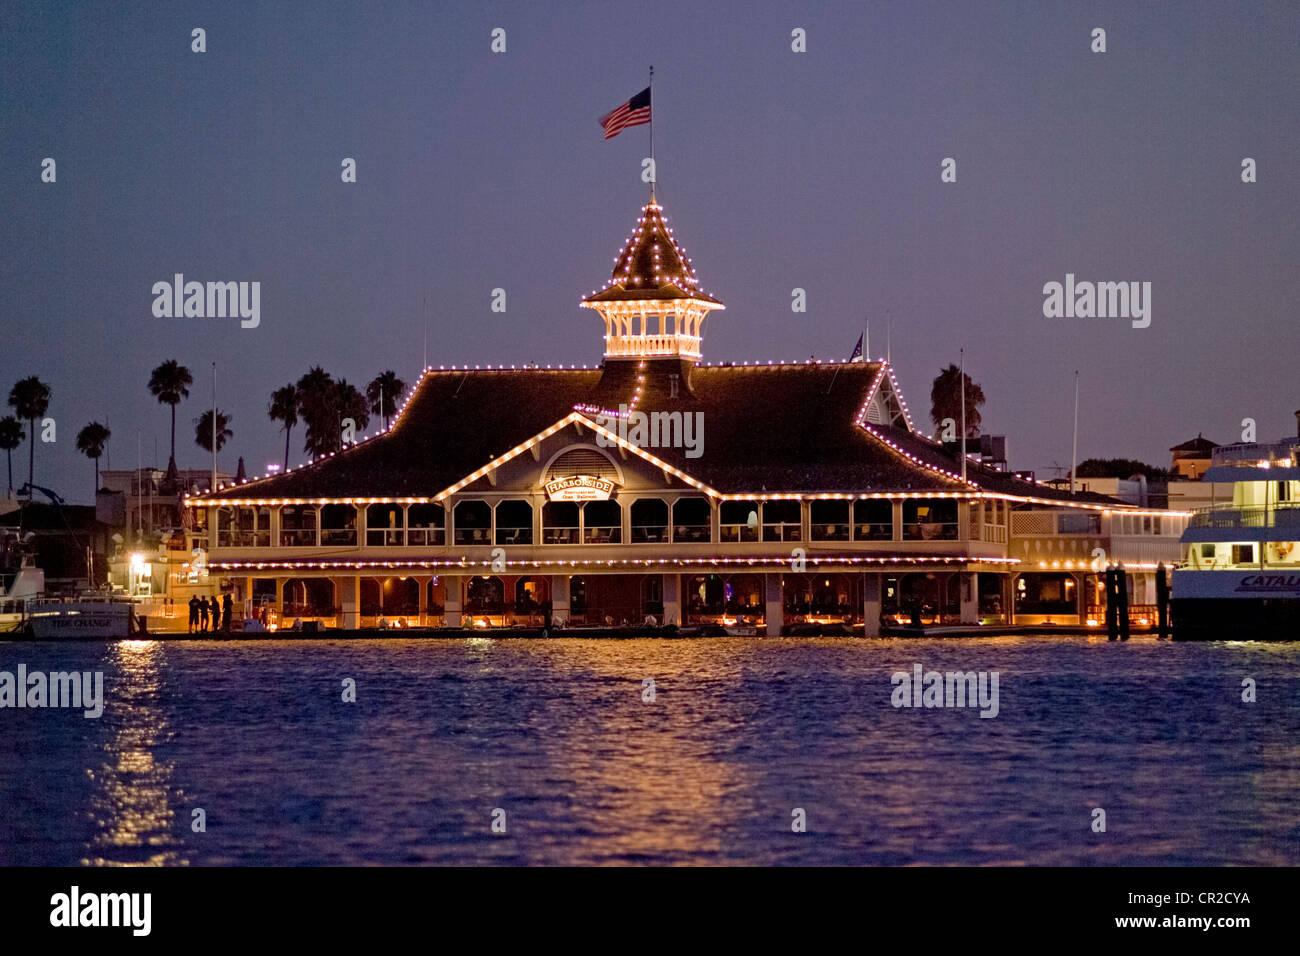 Landmark Restaurant Newport Beach